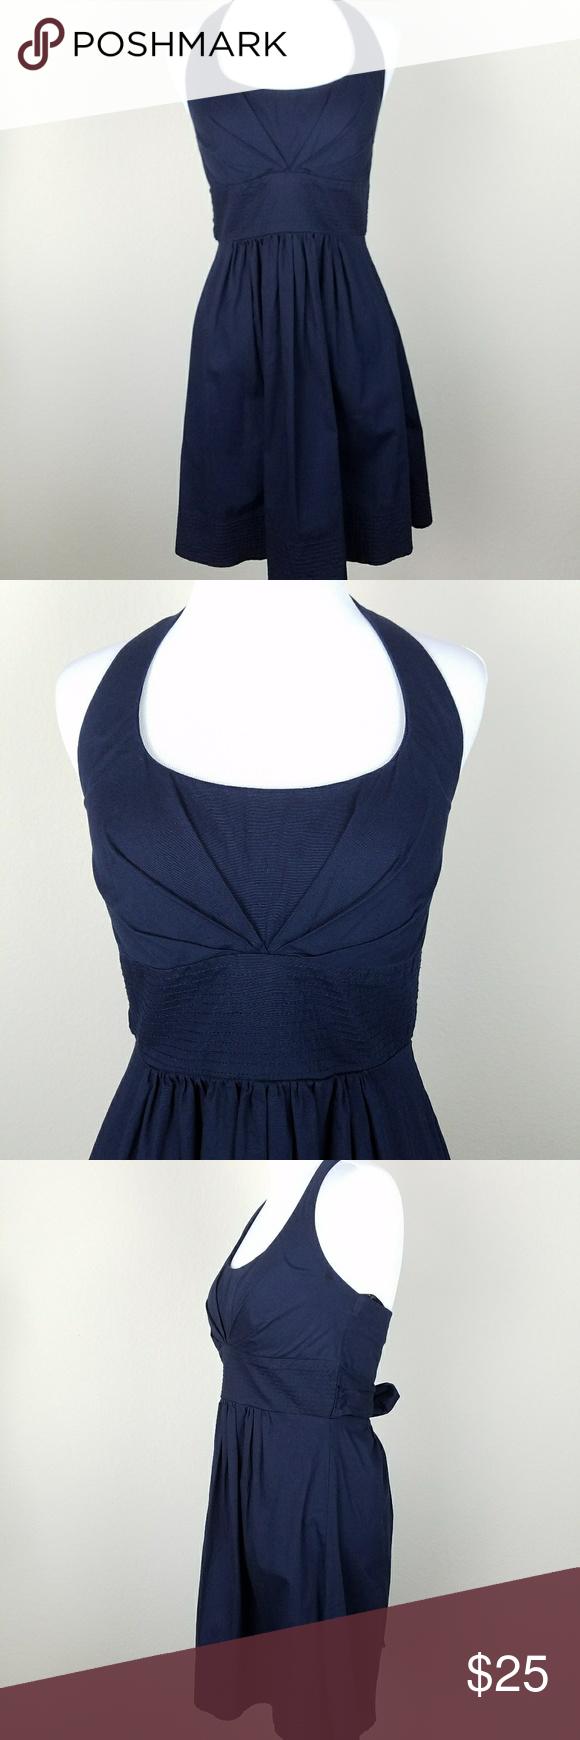 B darlin halter dress size navy blue conditioning and navy